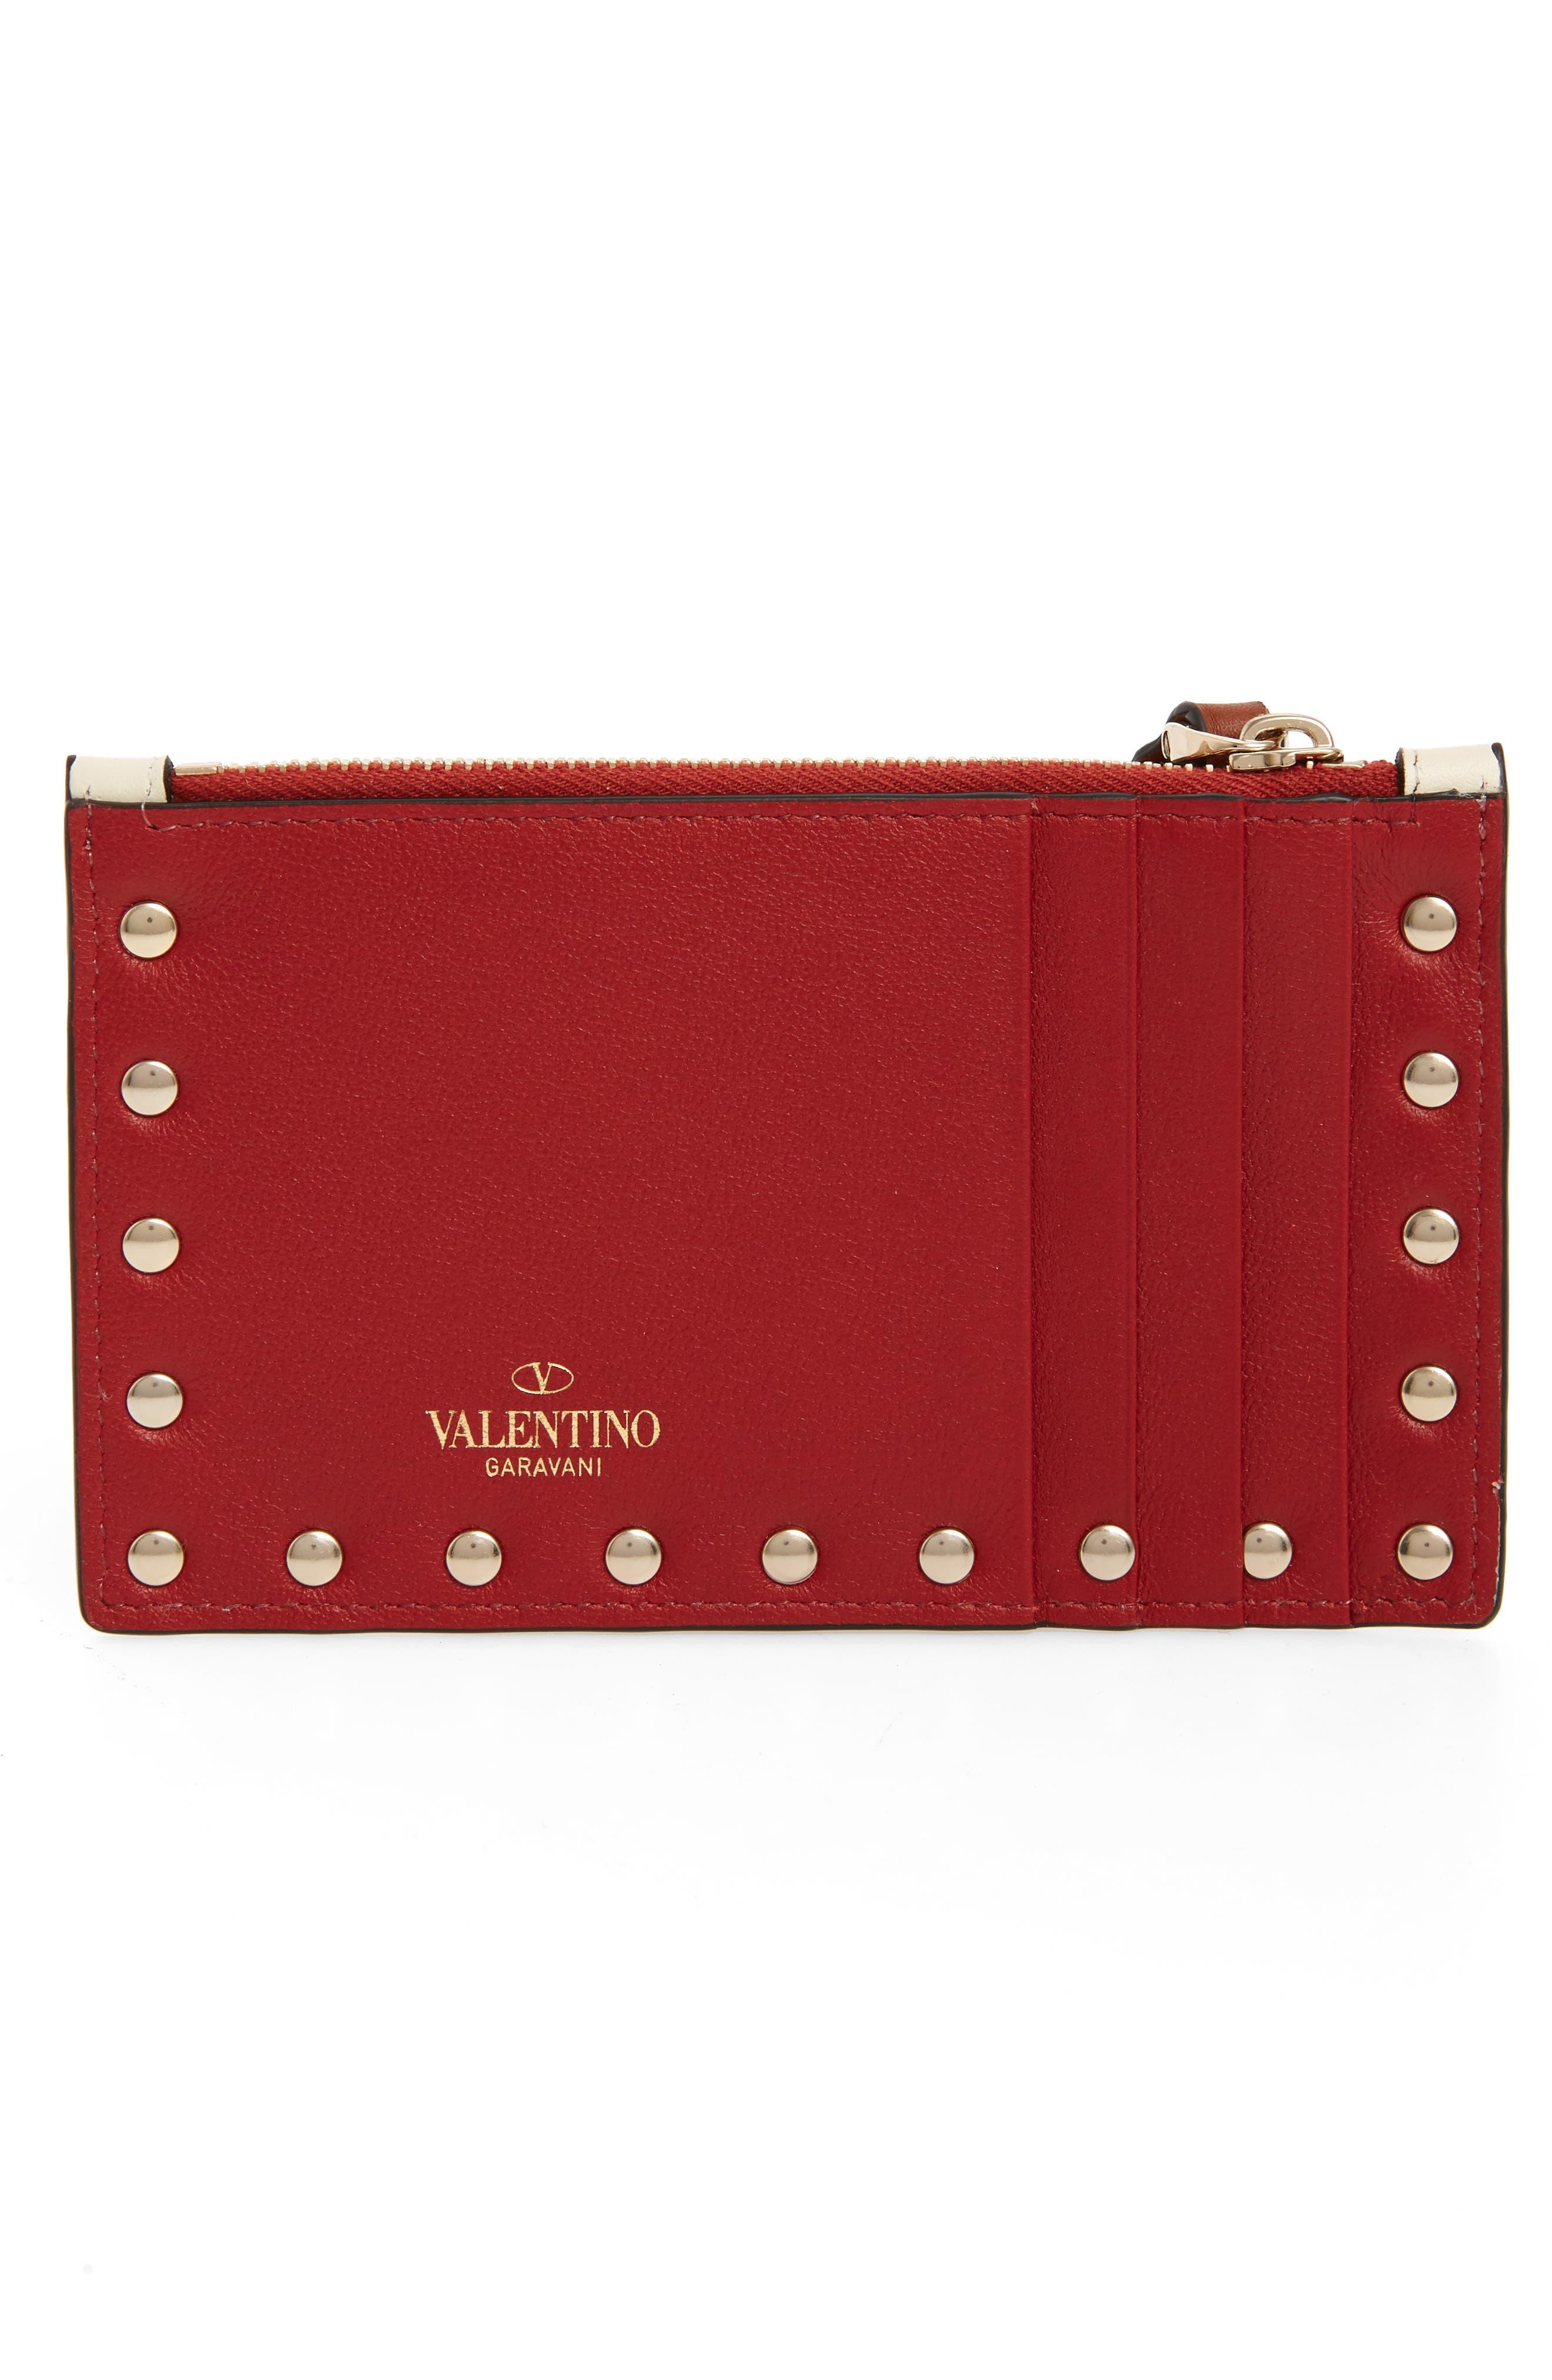 VALENTINO GARAVANI,                             Rockstud Leather Zip Card Case,                             Alternate thumbnail 2, color,                             ROSSO